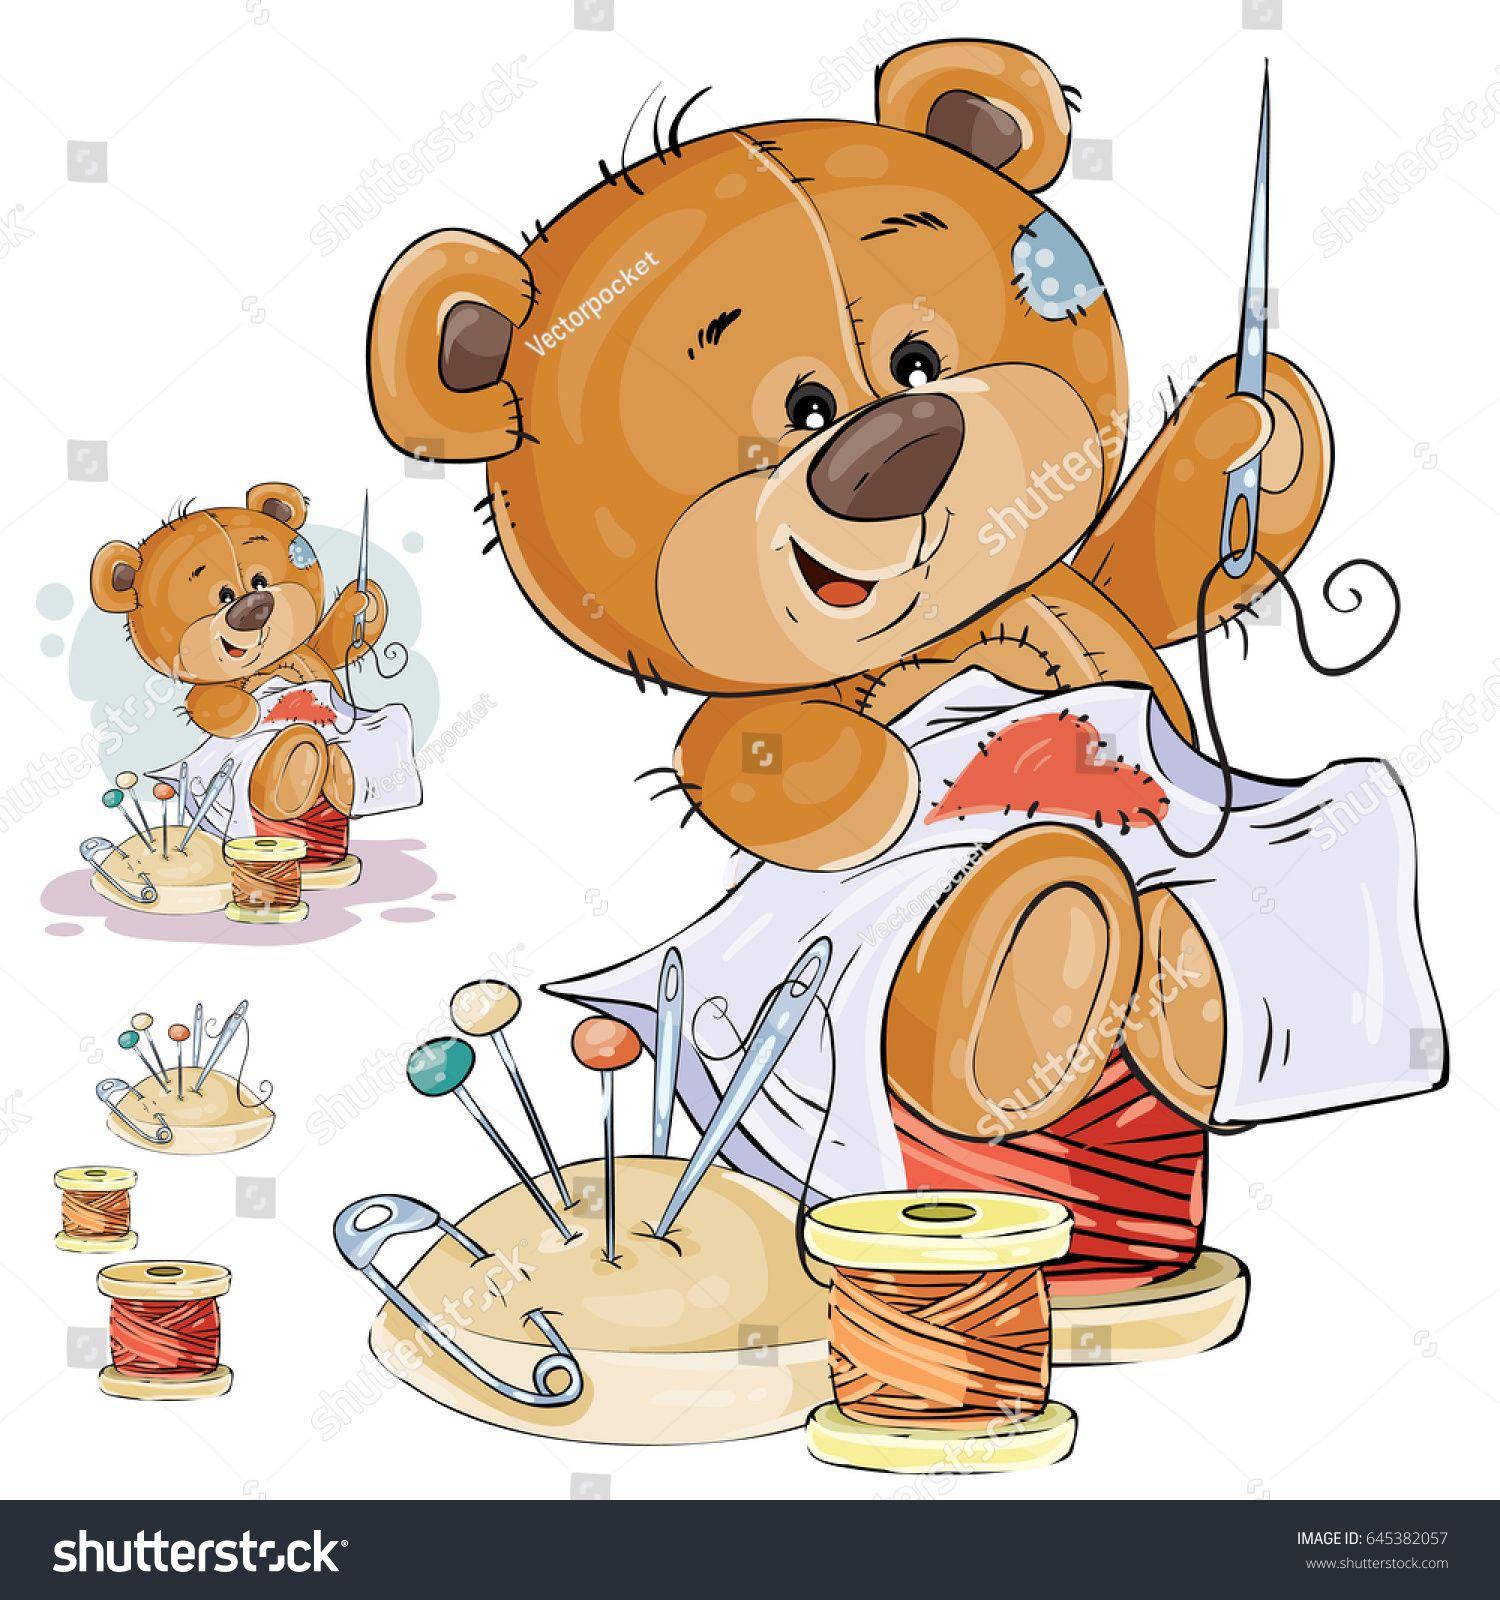 Vector Illustration Of A Brown Teddy Bear Tailor Sews A Red Patch In The Shape Of A Heart Print Template Design E Bear Art Cute Teddy Bears Brown Teddy Bear